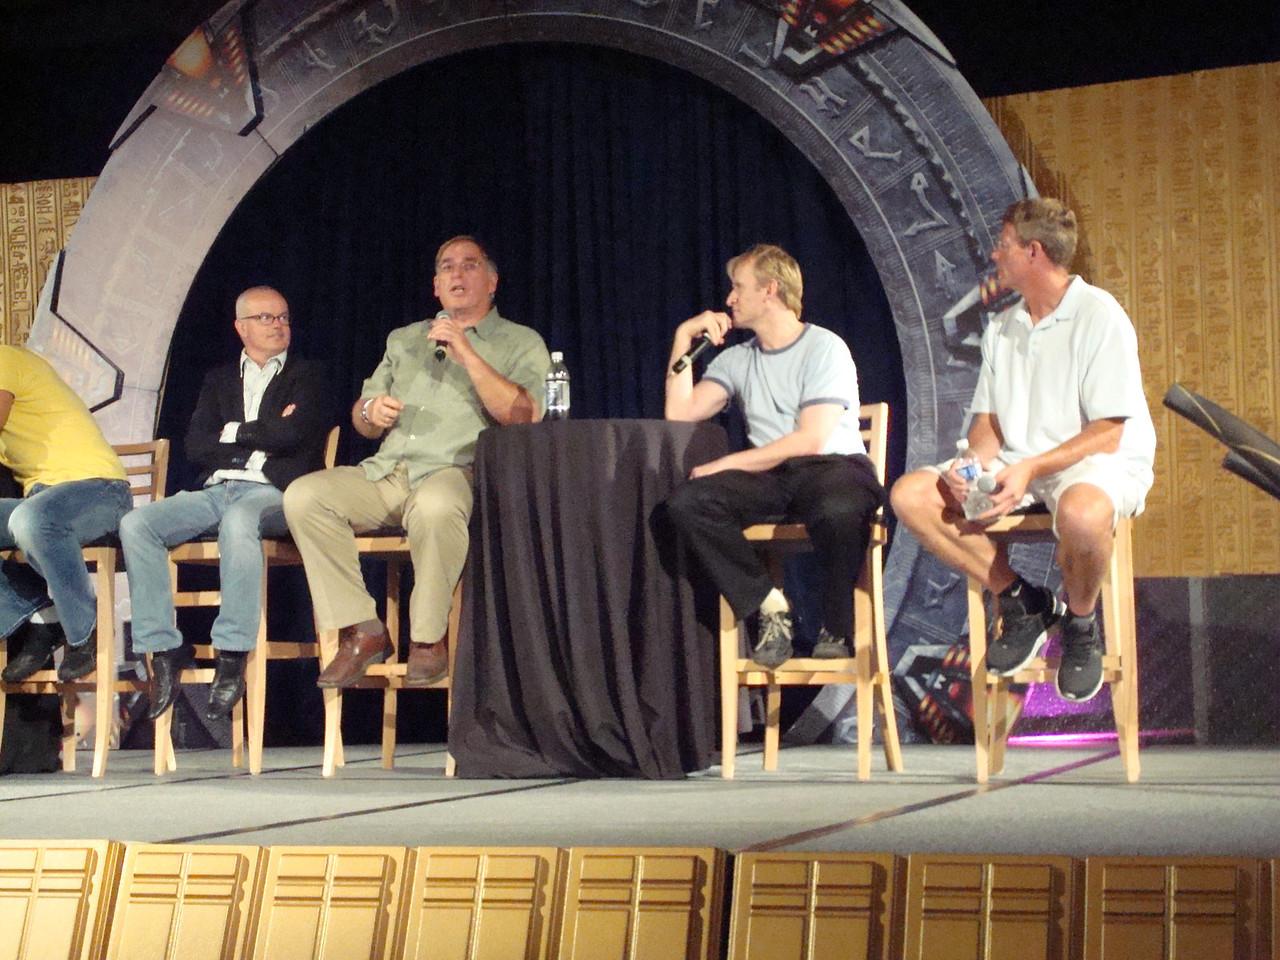 Gary Jones (Sgt. Walter Davis/Harriman), Gary Chalk (Colonel Chekhov), Dean Haglund (one of the Lone Gunmen from X-Files), Dan Shea (Sergeant Siler and stunt guru)